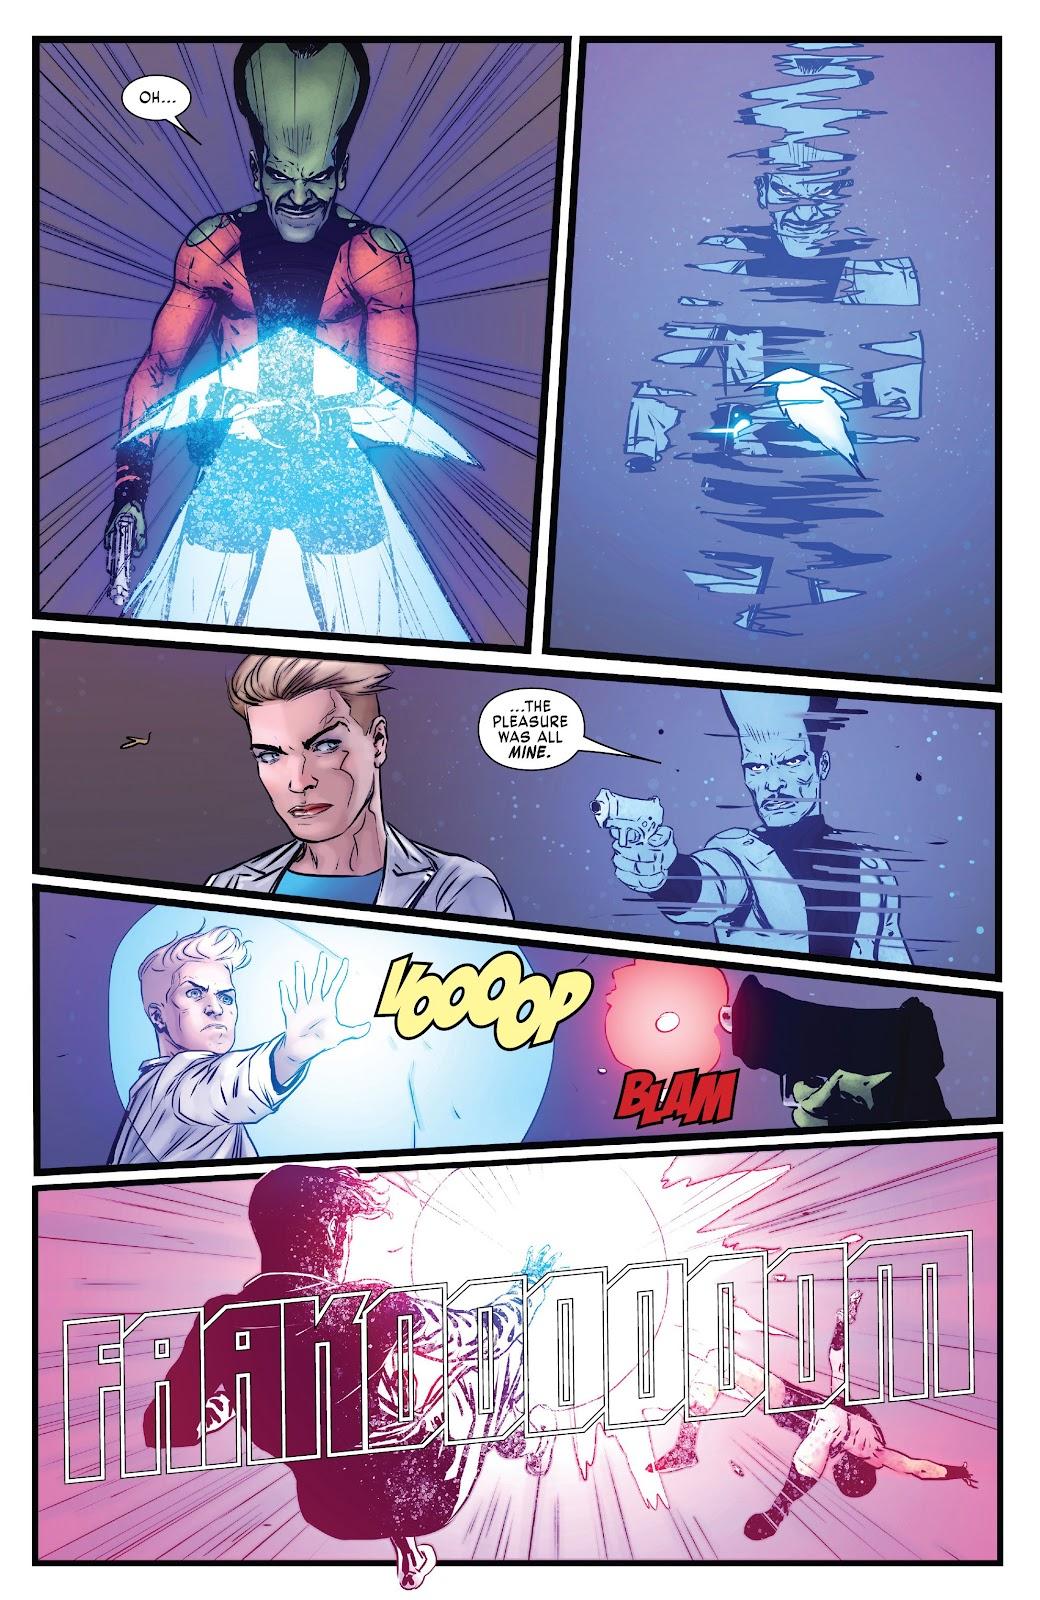 Read online Hulkverines comic -  Issue #2 - 18